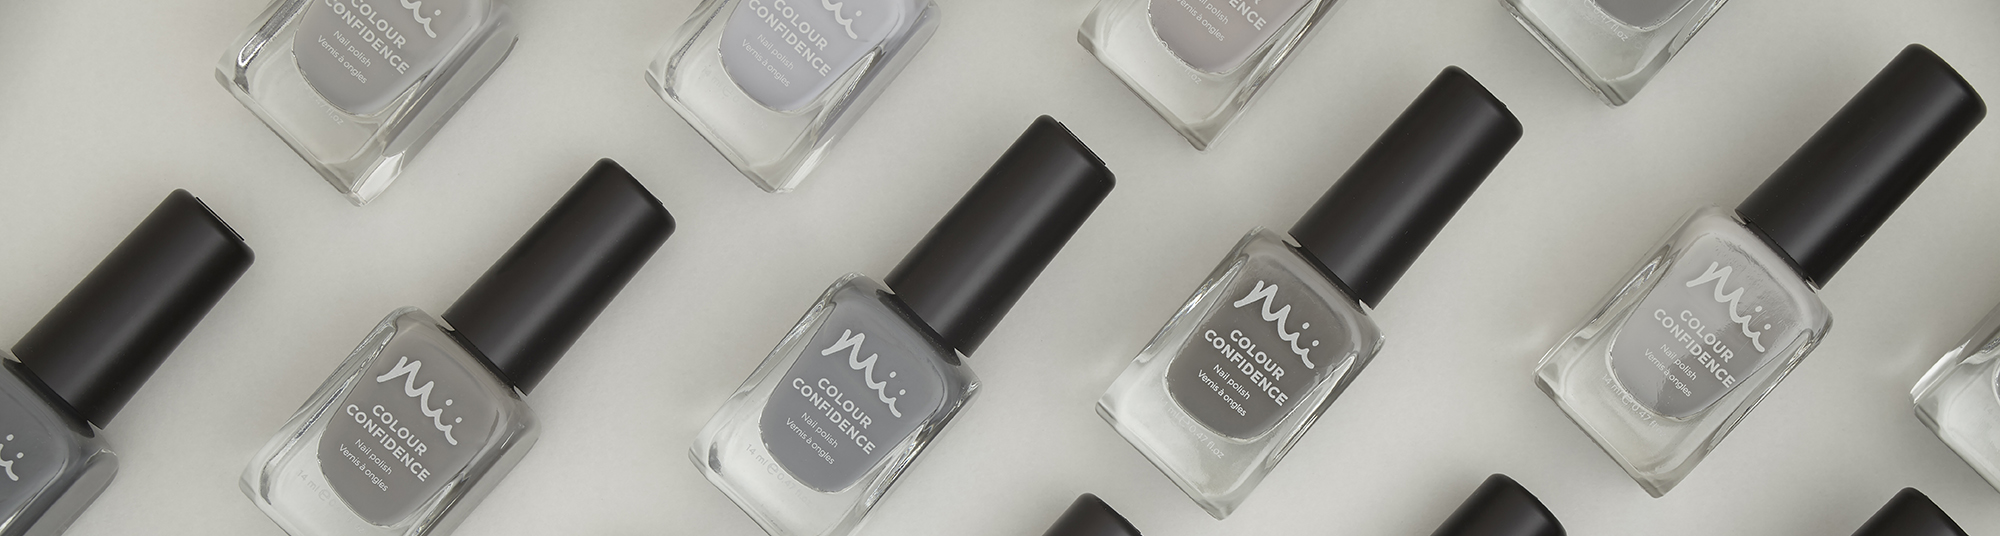 Mii Colour Confidence Nail Polish Grey Category